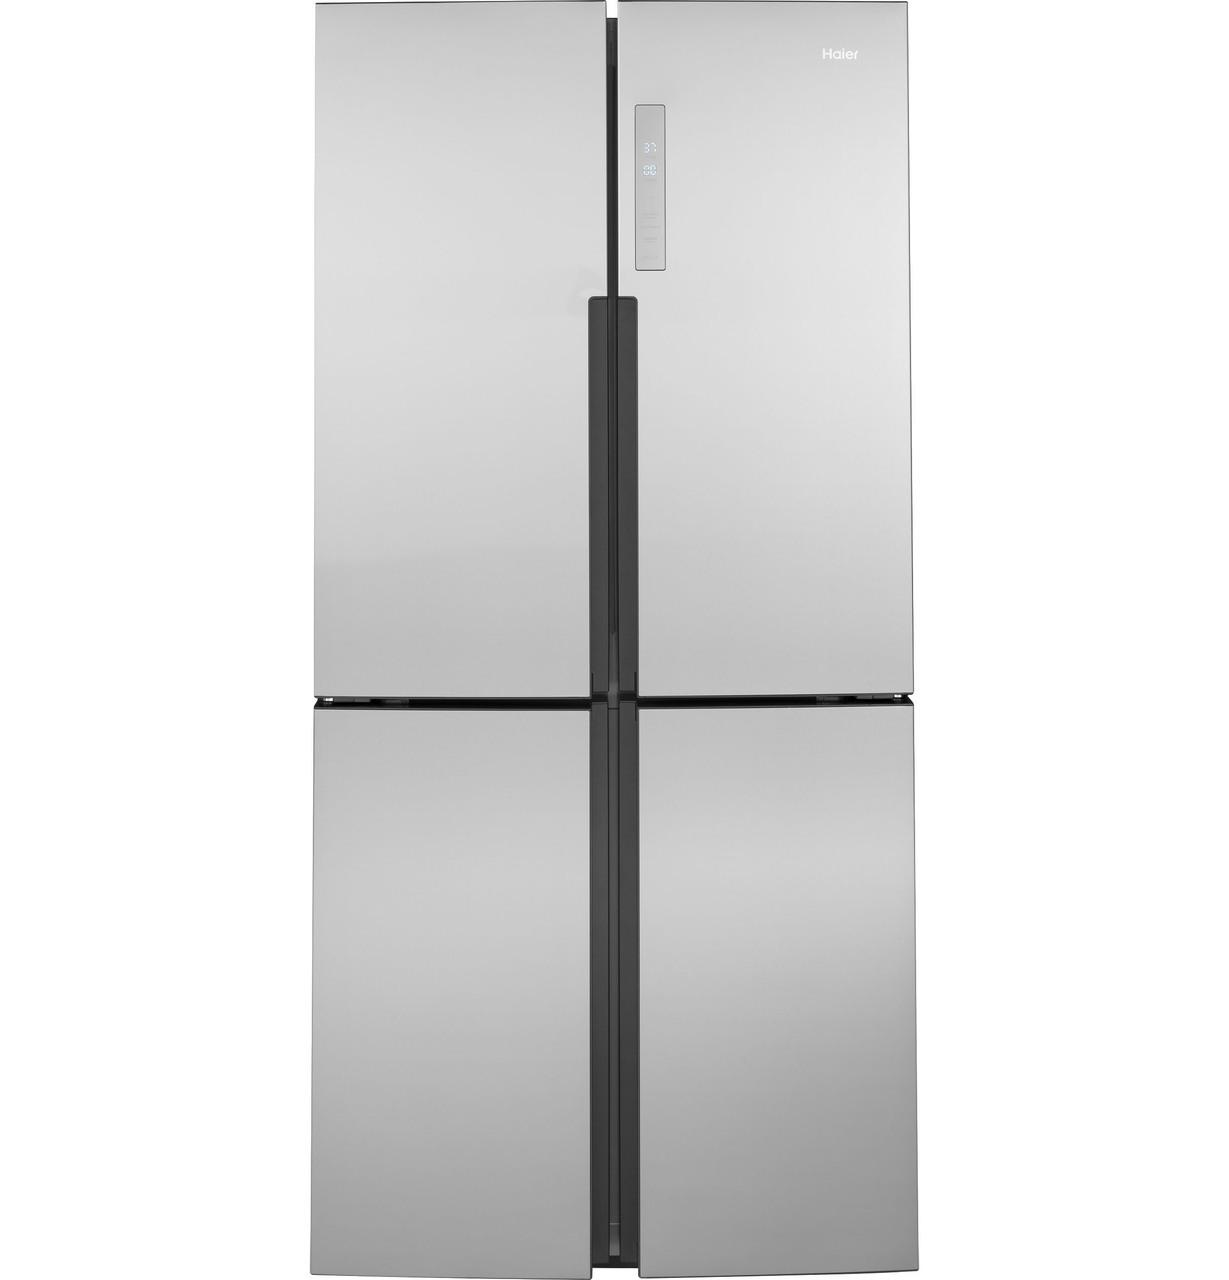 Haier Appliance16.4 Cu. Ft. Quad Door Refrigerator